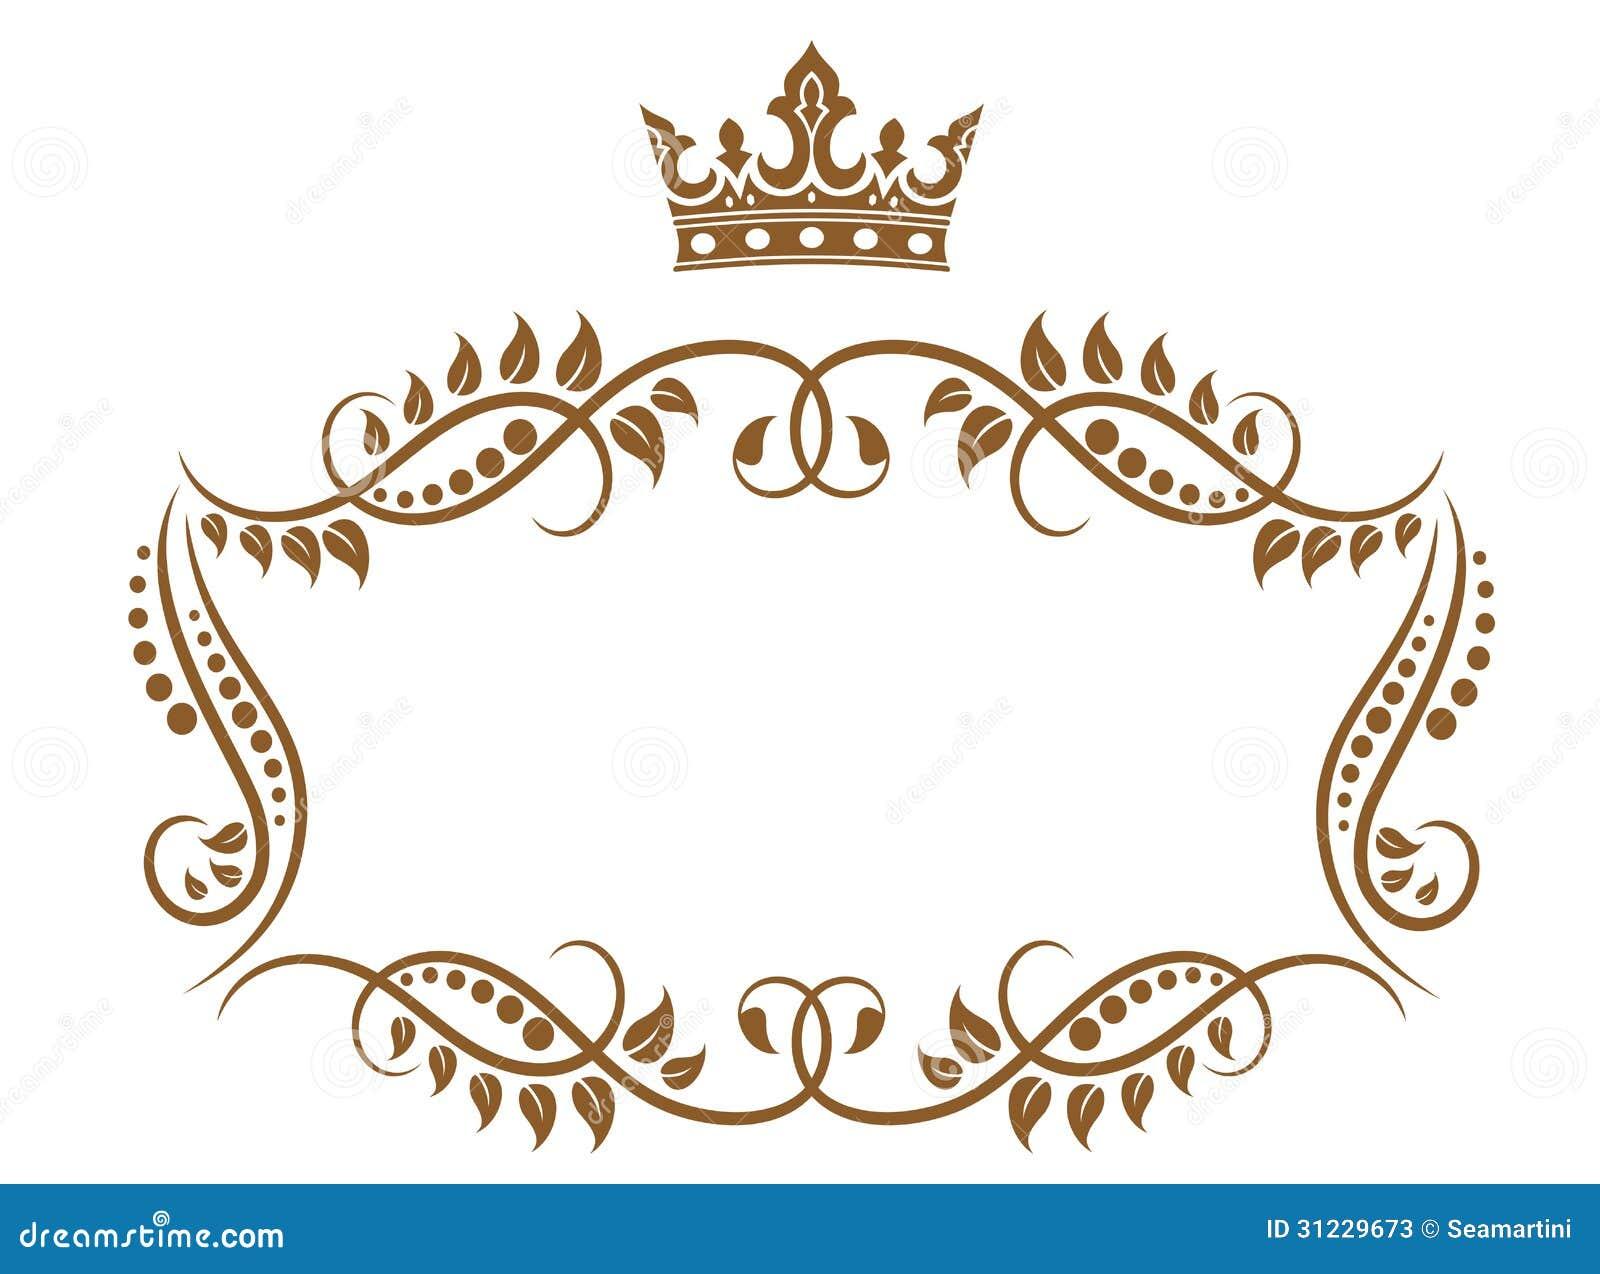 Elegant Royal Medieval Frame Stock Vector Illustration Of Border